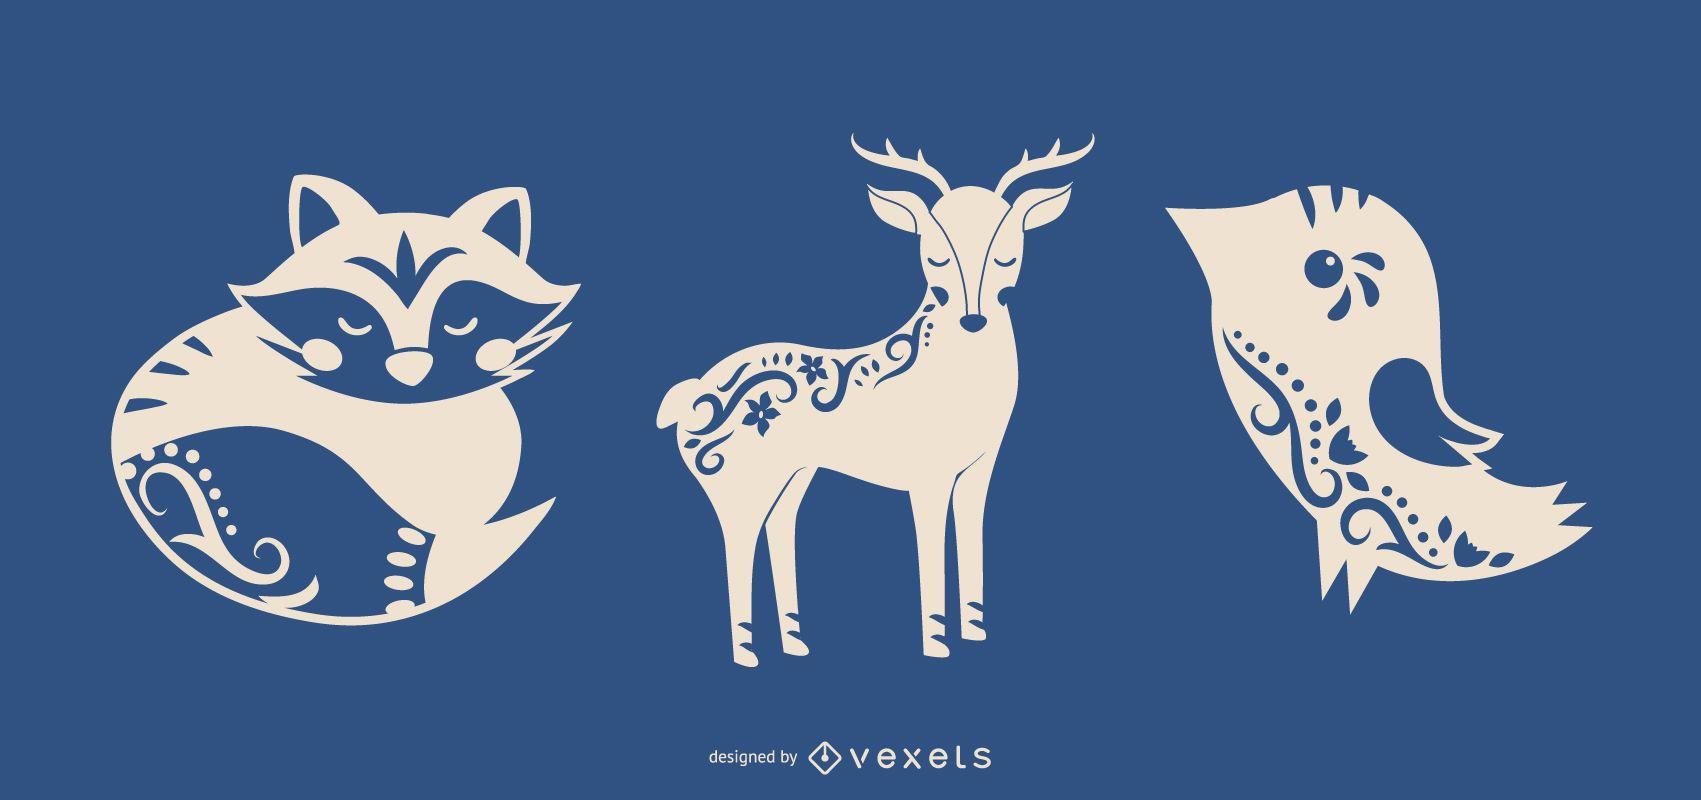 Folk art silhouette animals